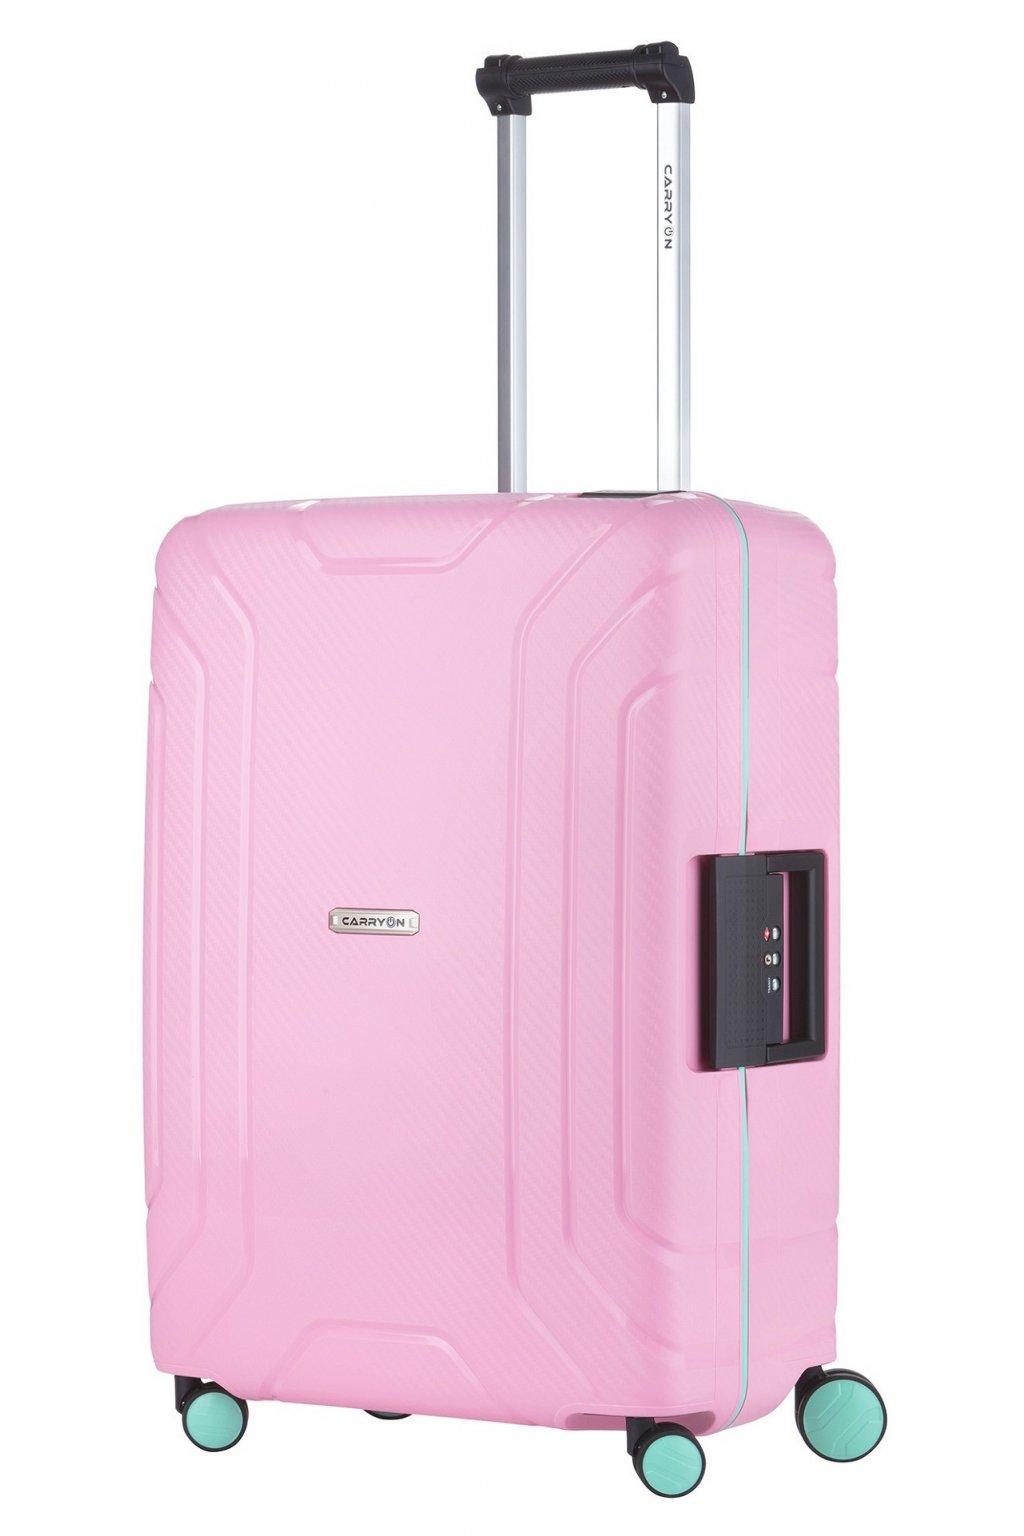 kufrland carryon steward pink (1)